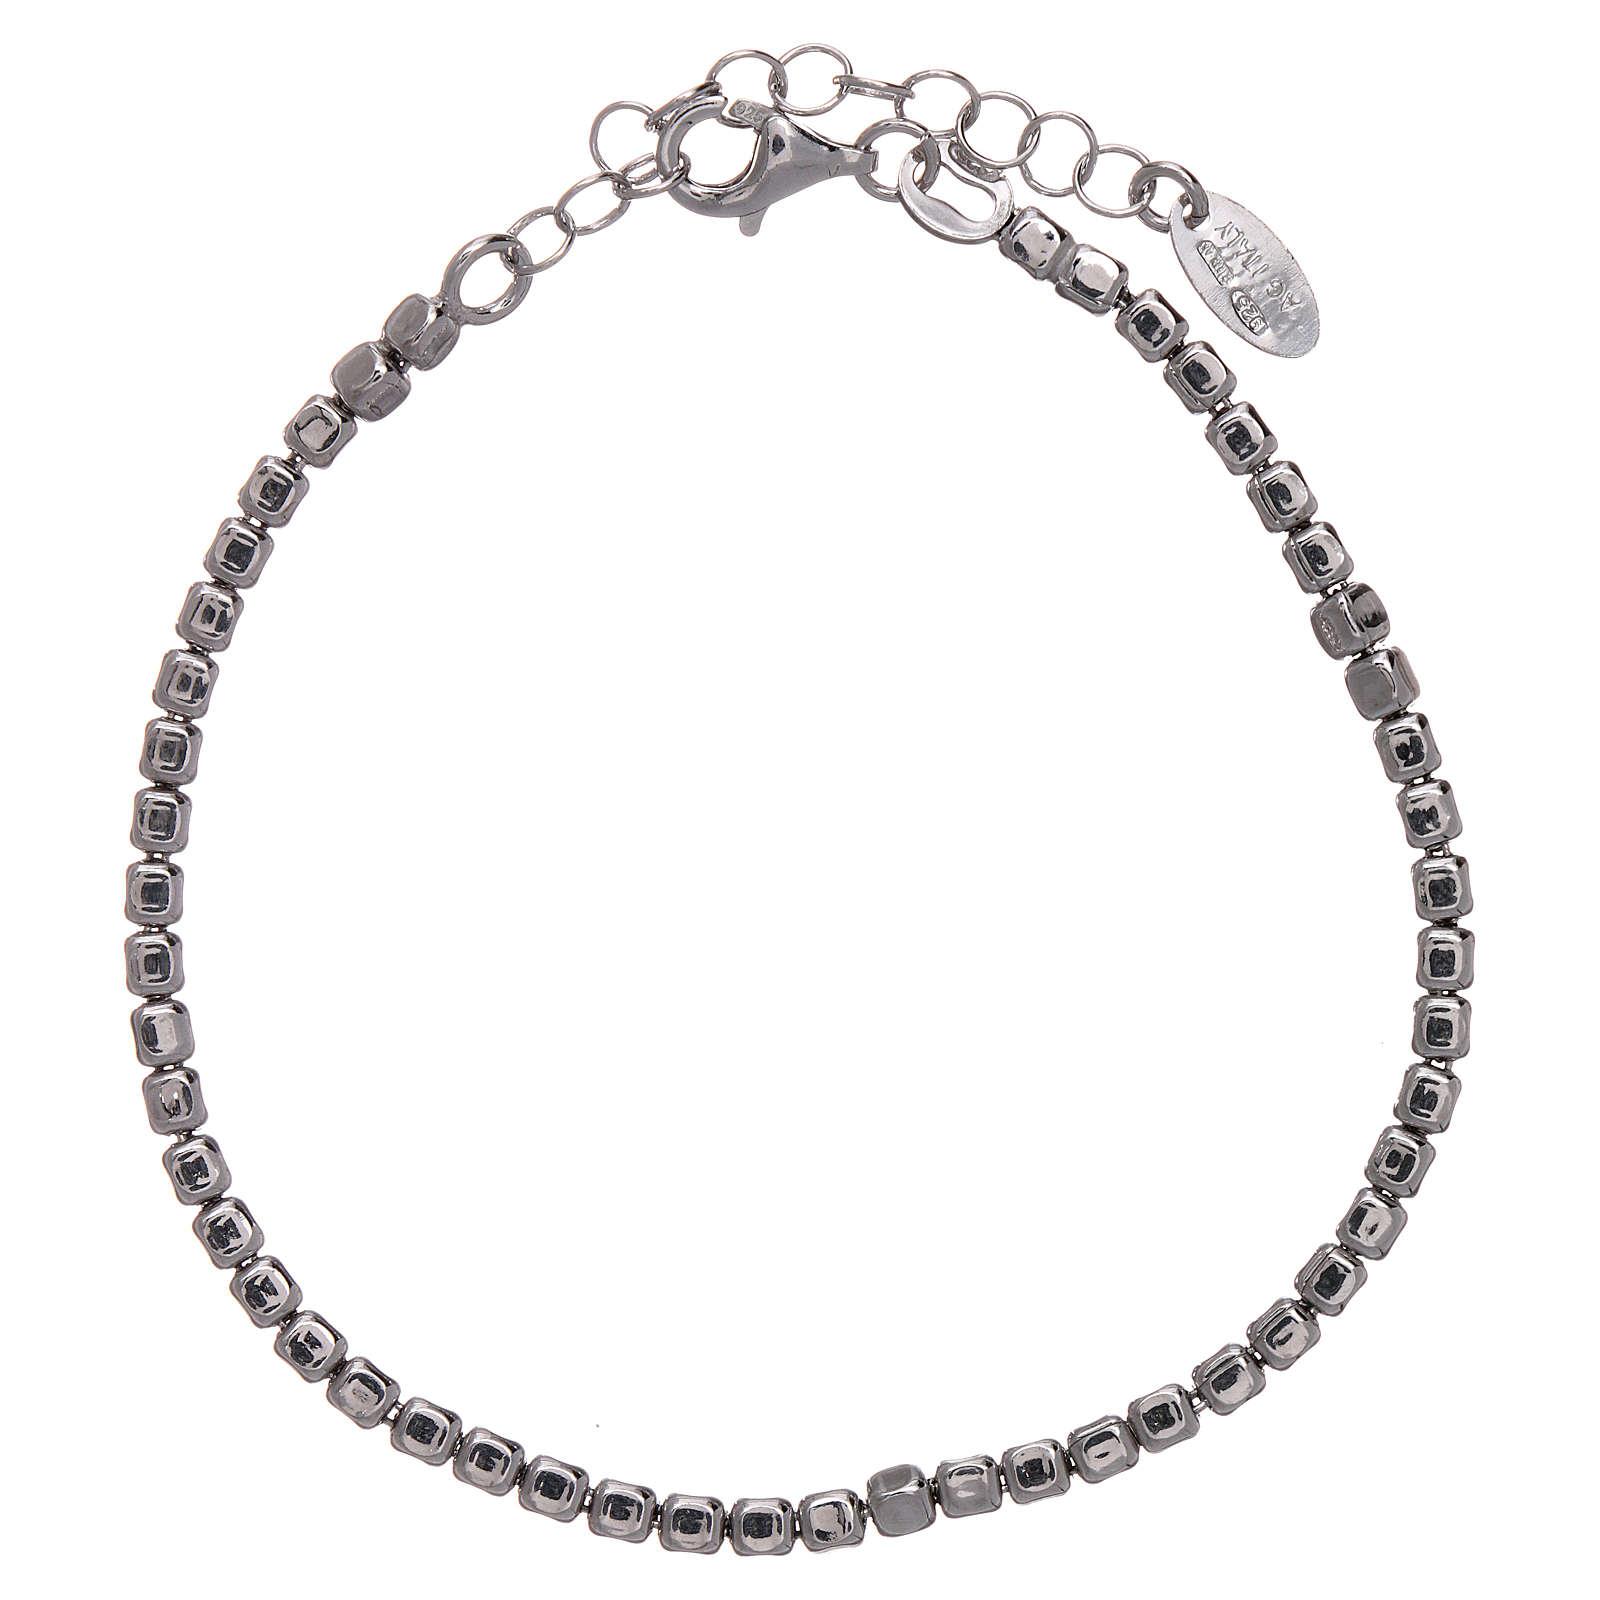 Armband AMEN Silber 925 mit Klumpen 4